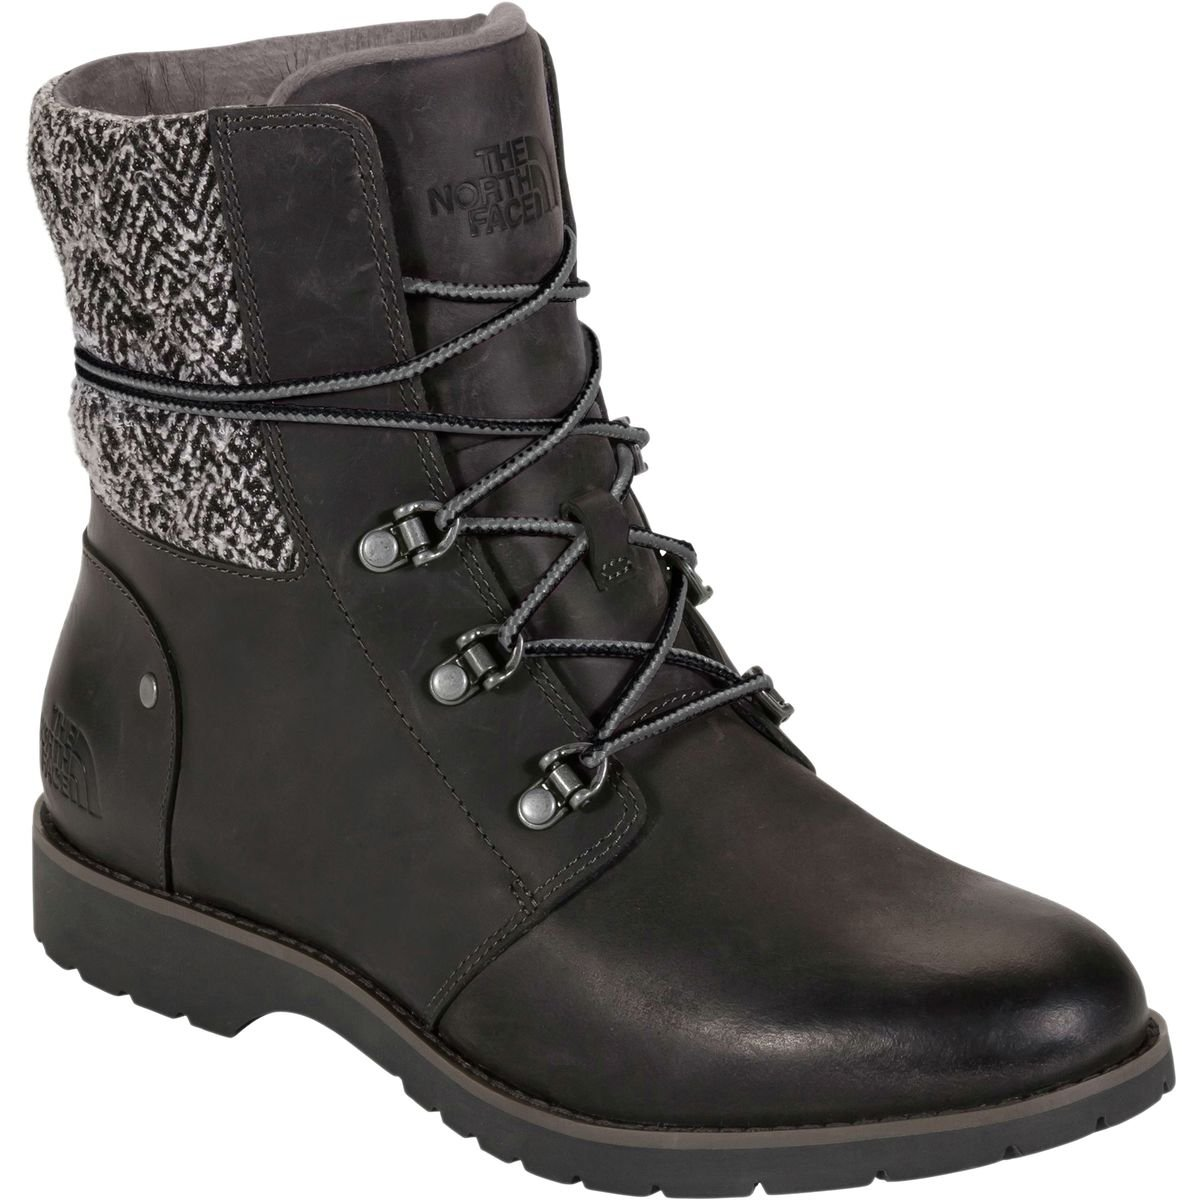 The North Face Women's Ballard Lace Up Boot B00RW5EBJC 10.5 B(M) US Paloma Grey/Tnf Black Jumbo Herringbone/Textile (Prior Season)